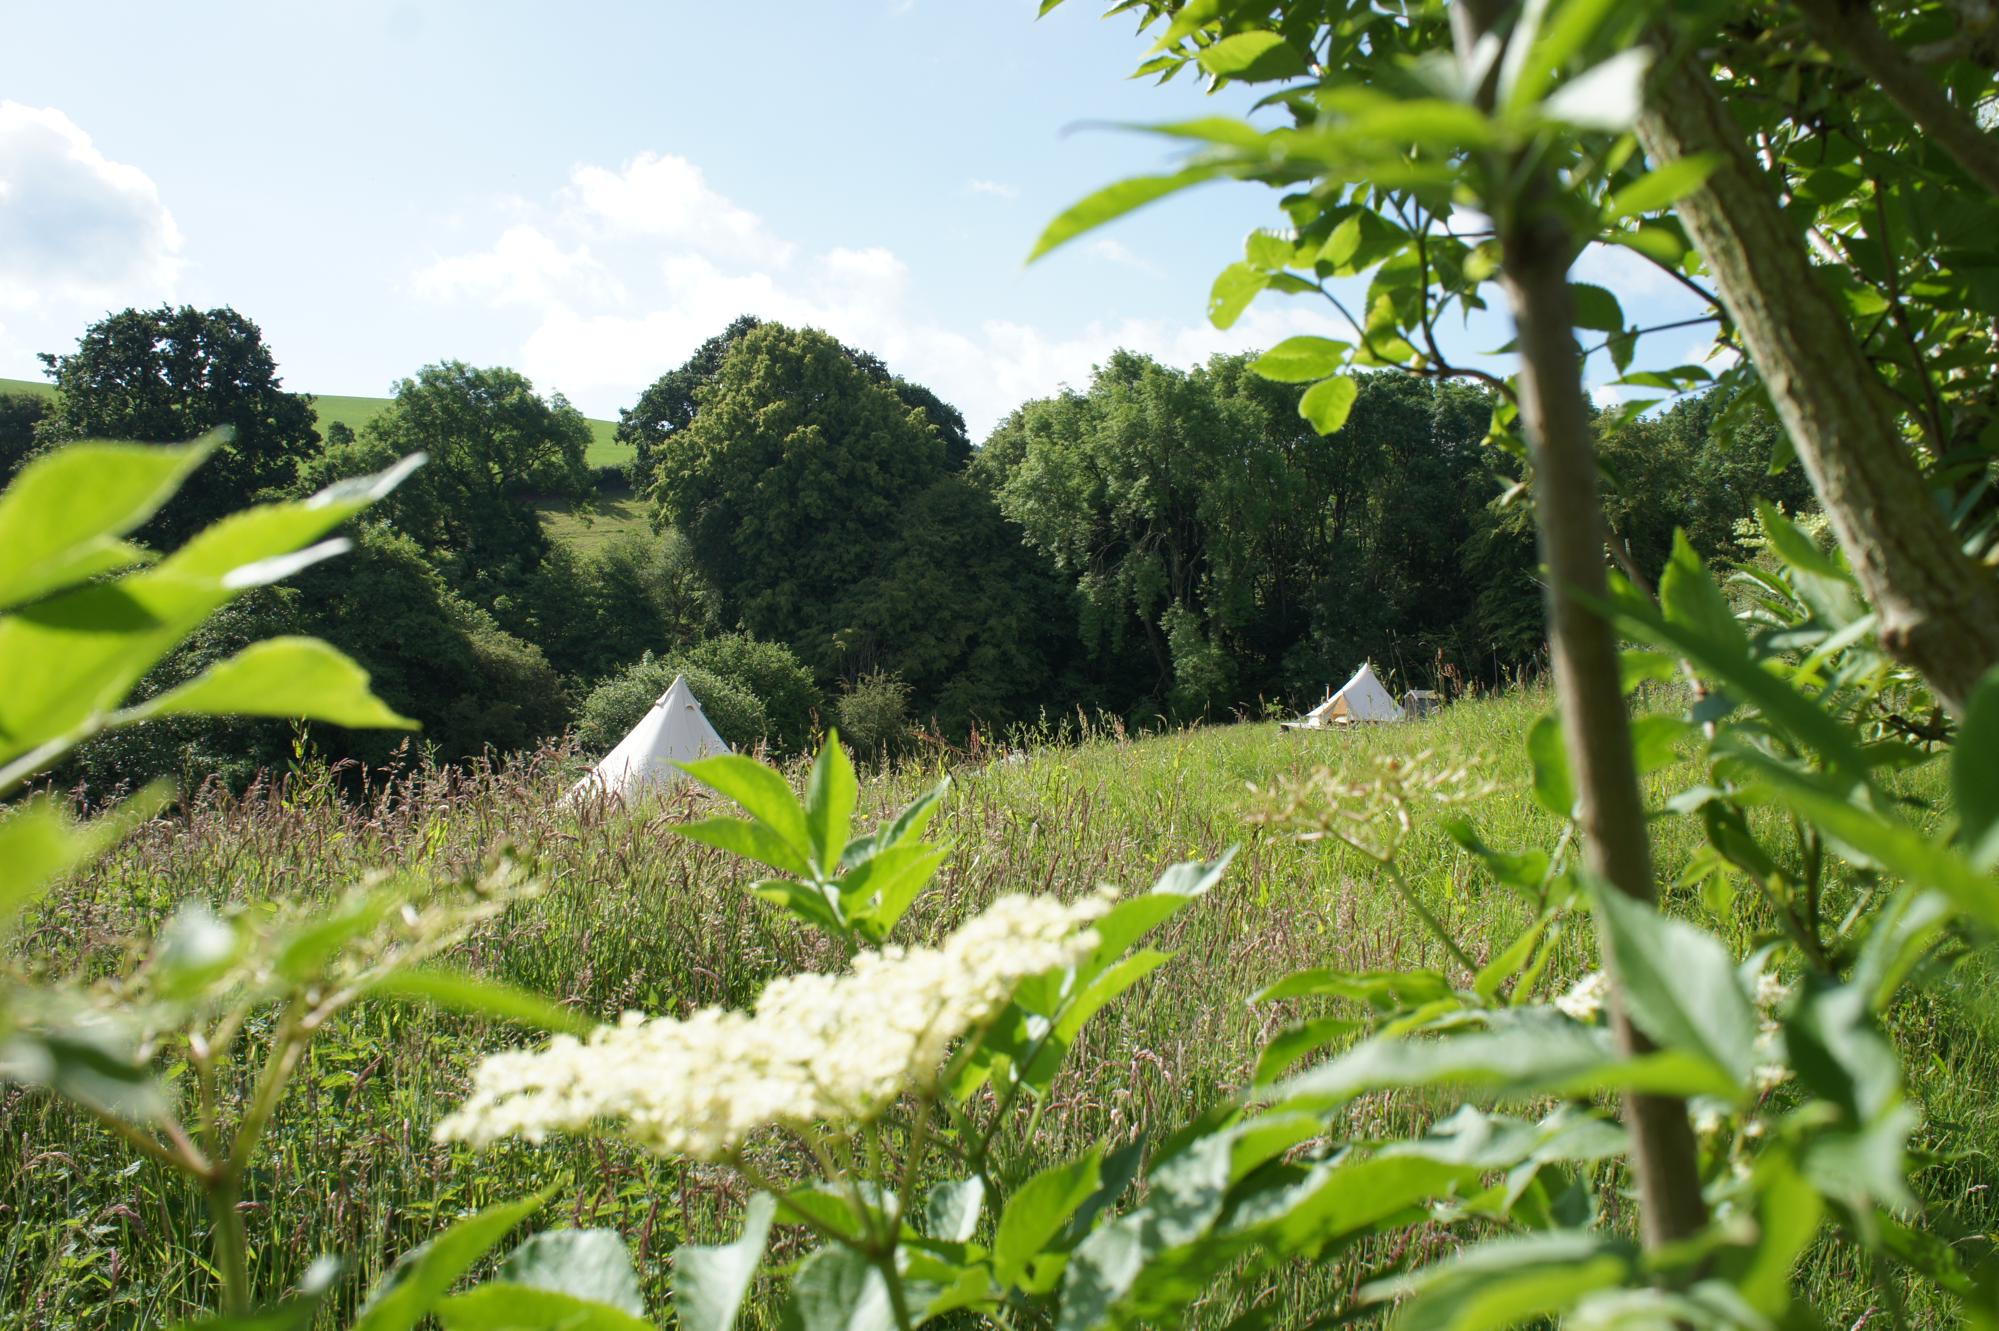 Campsites in Tenbury Wells – Cool Camping